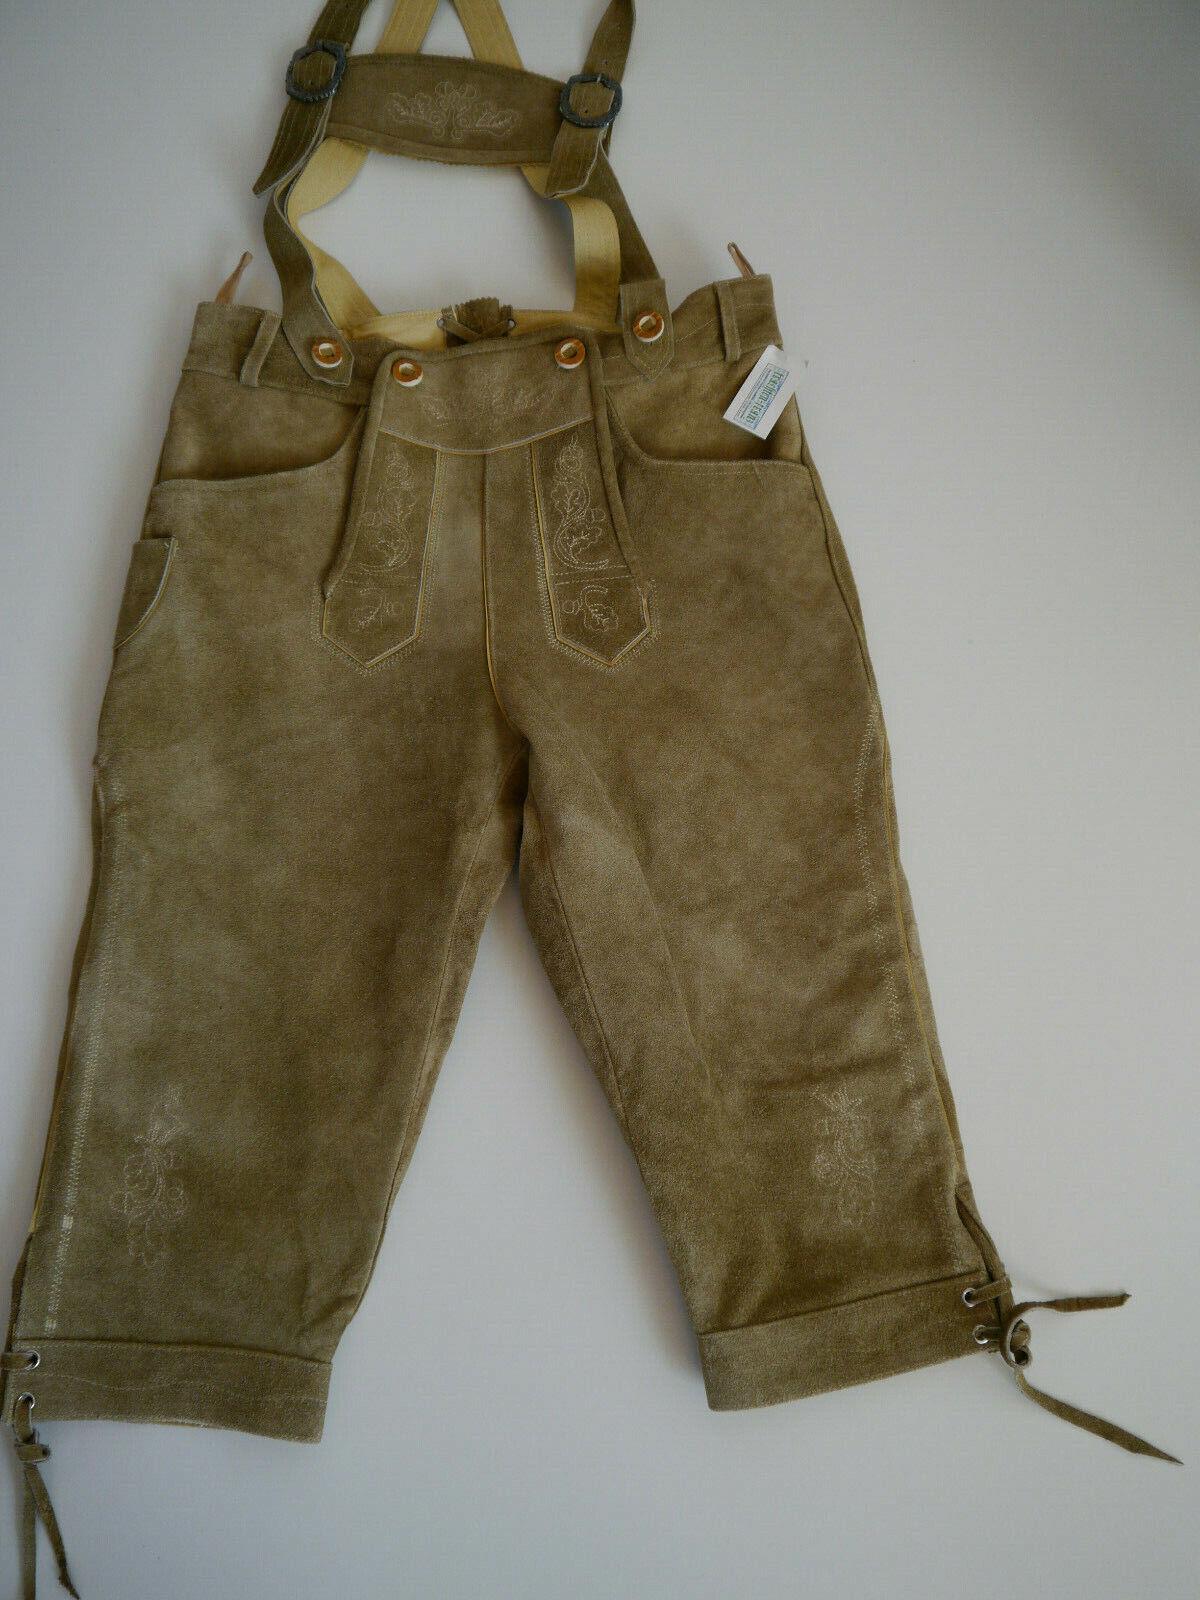 Original Trachten - Kniebundhose Fb. nuss 100% echtes Leder Gr. 44 - 60 NEU